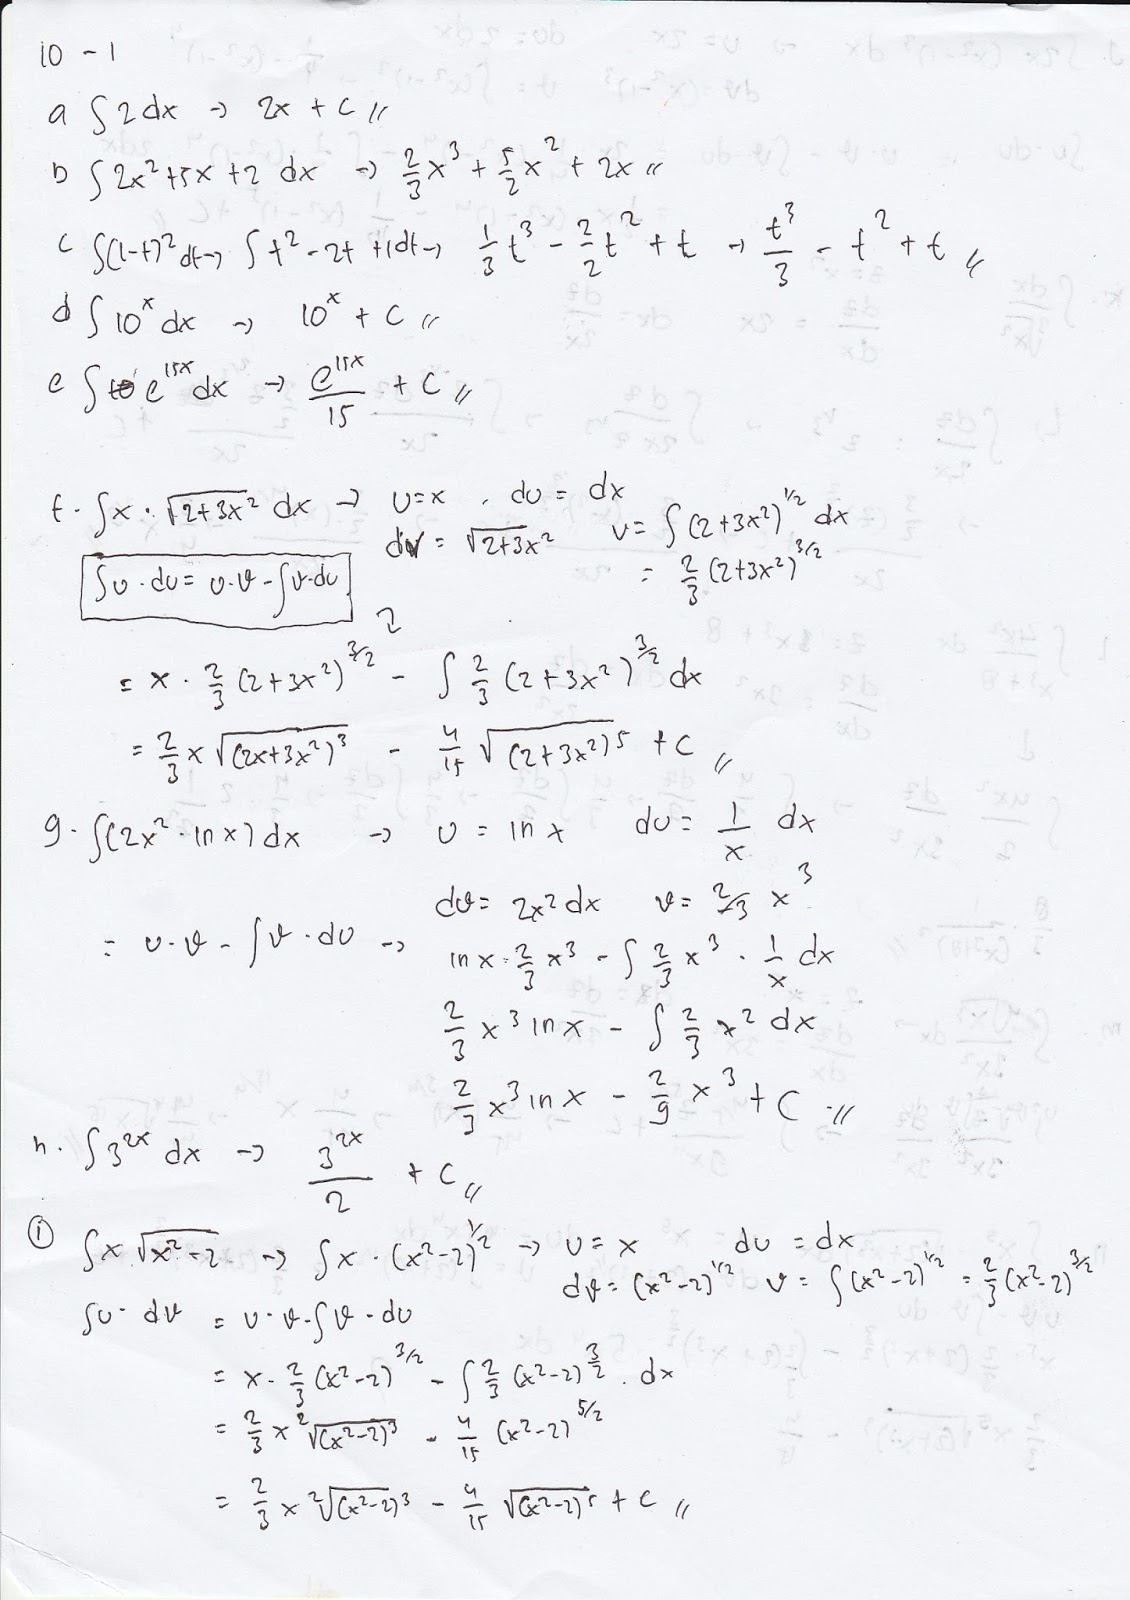 06/01/2021· kunci jawaban buku statistika nata wirawan edisi keempat. Matematika Ekonomi Buku Karya Nata Wirawan Halaman 263 Tentang Integral Mai Melajah